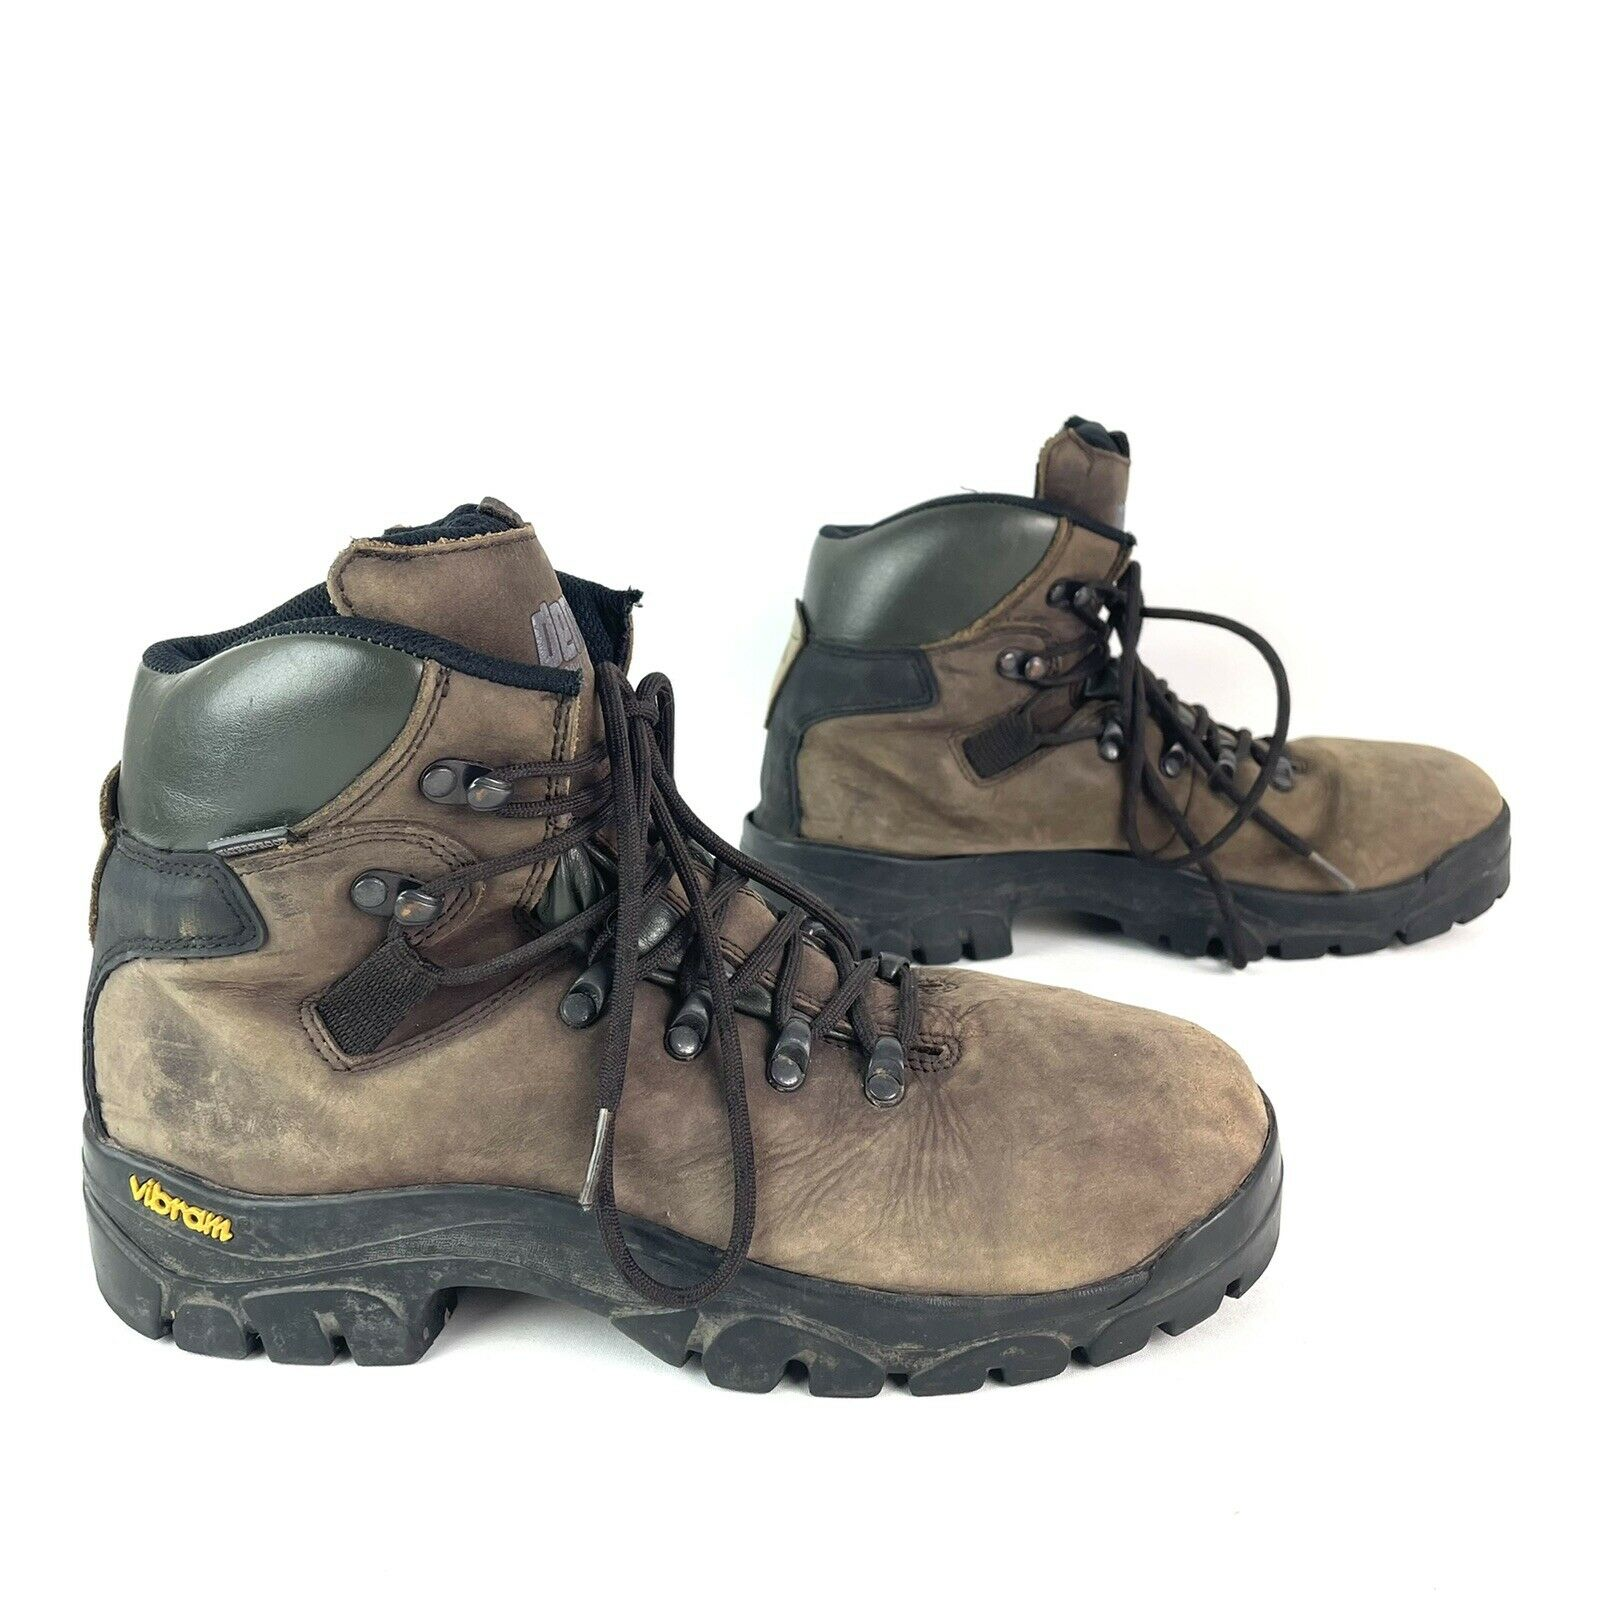 Denali Mens Vibram Sole Leather Hiking Boots Size Us 9